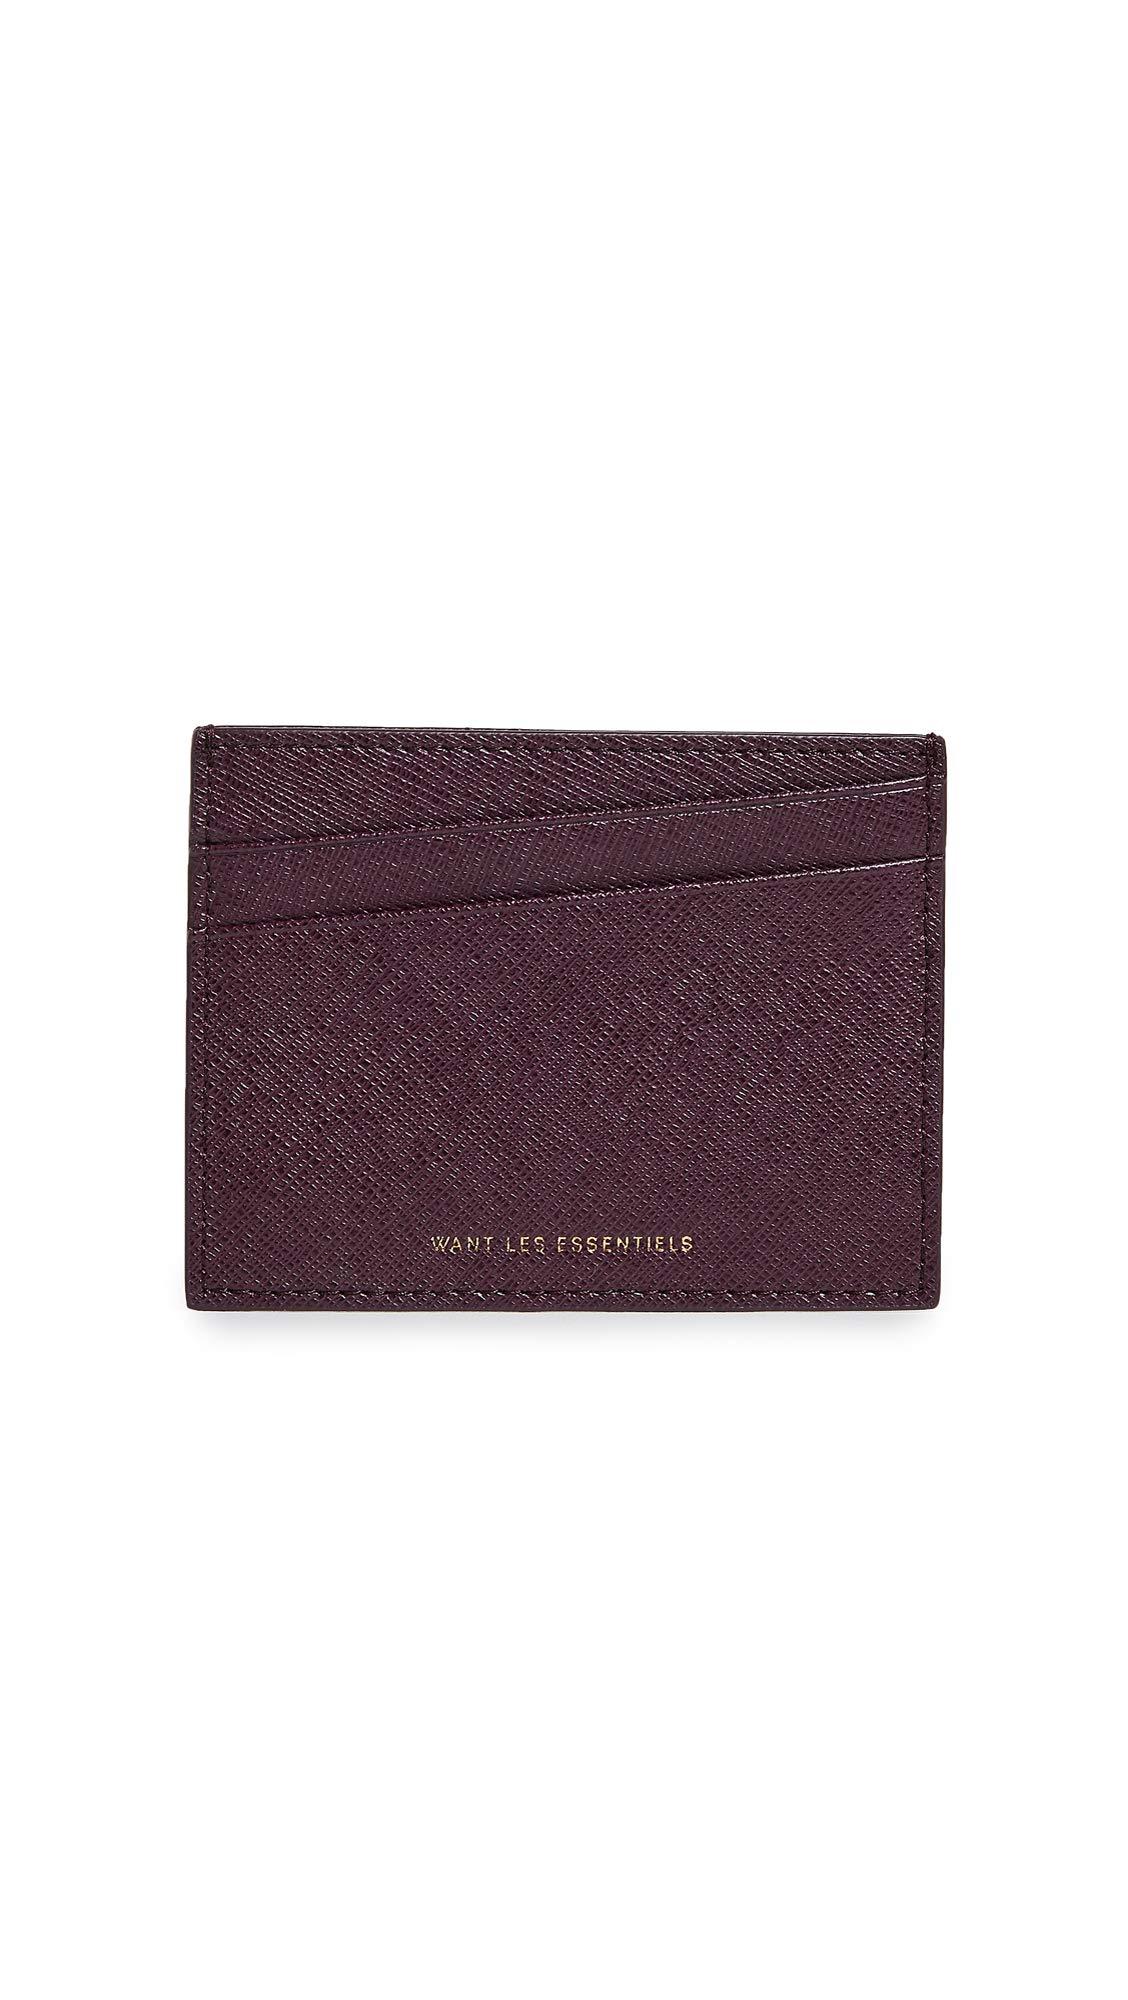 WANT Les Essentiels Women's Branson Card Holder, Aubergine, Purple, One Size